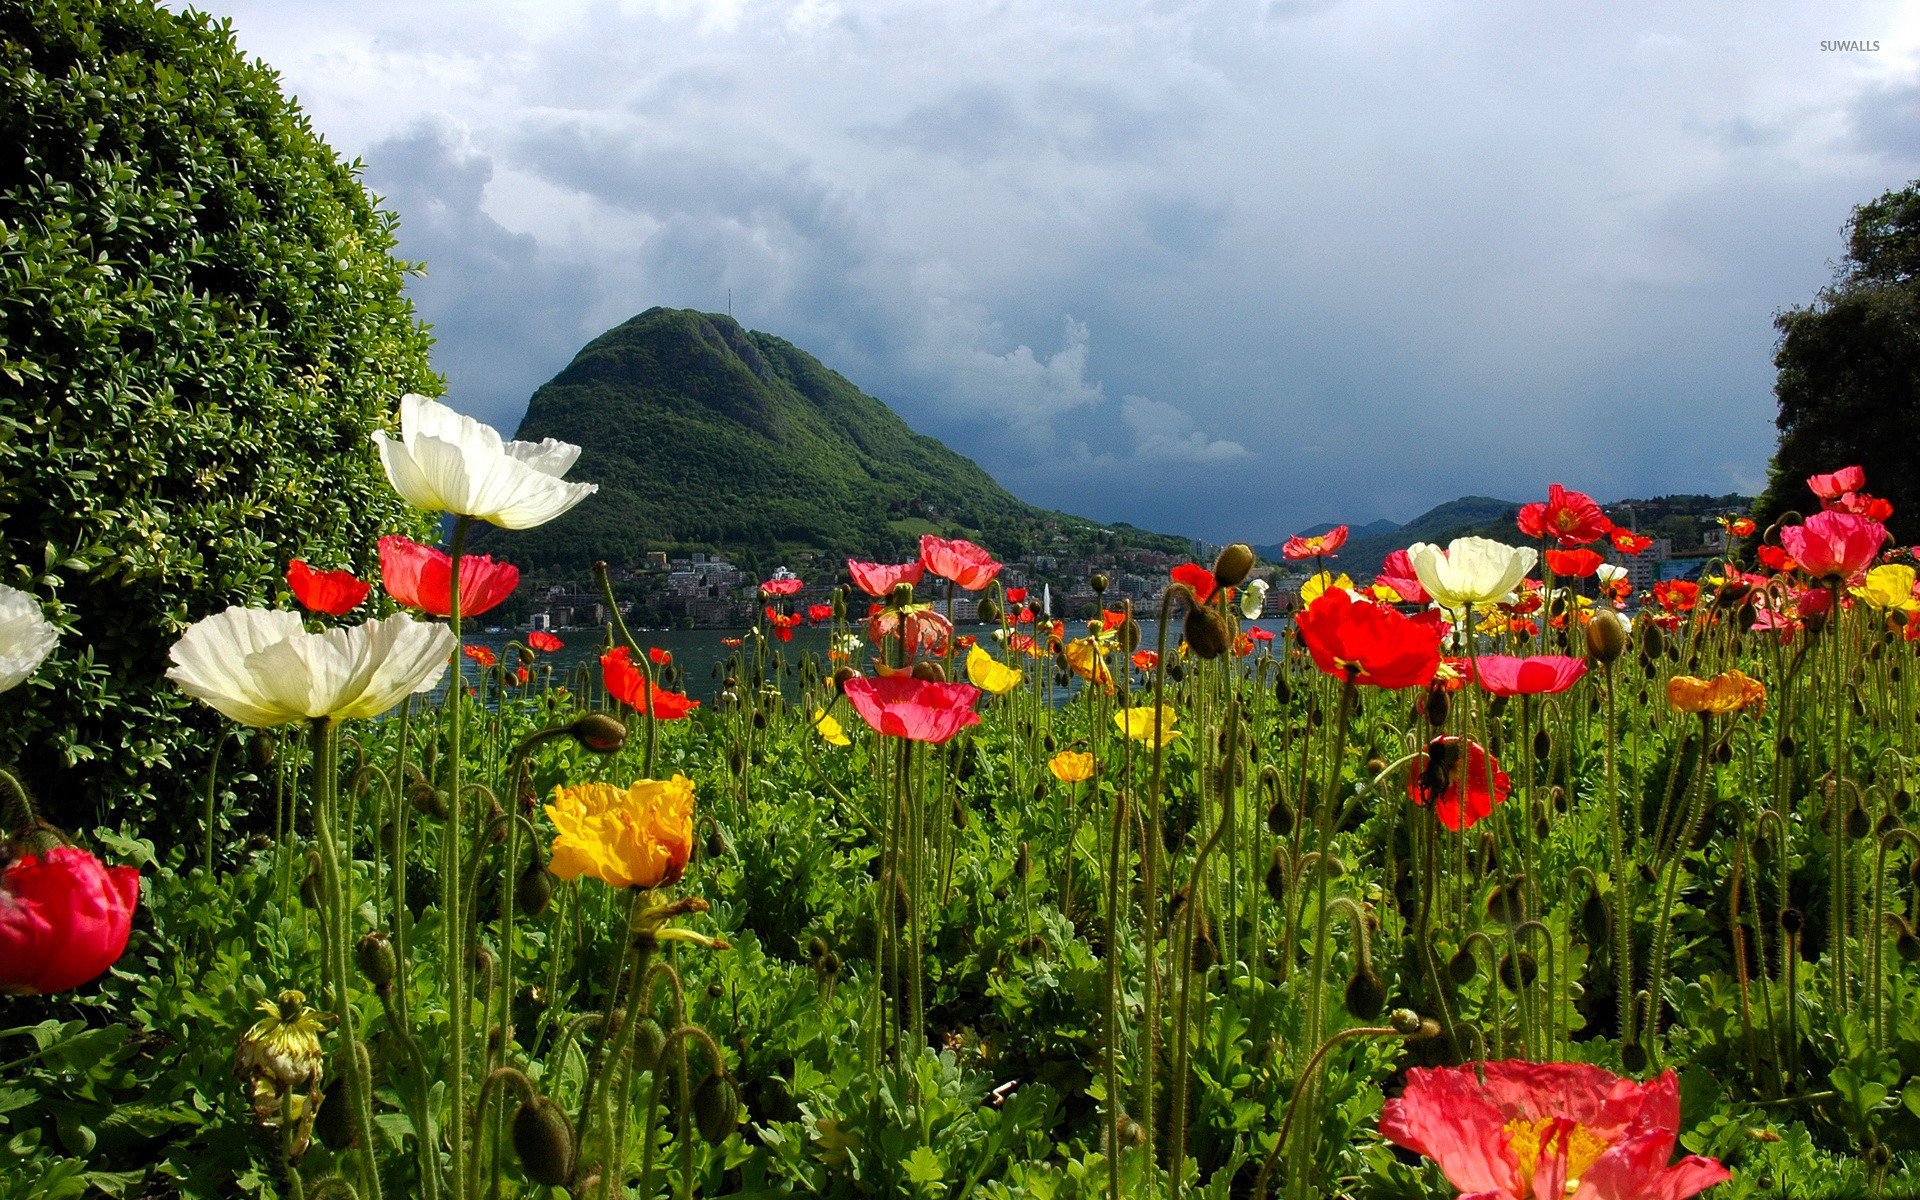 Lovely poppy field by the lake wallpaper jpg